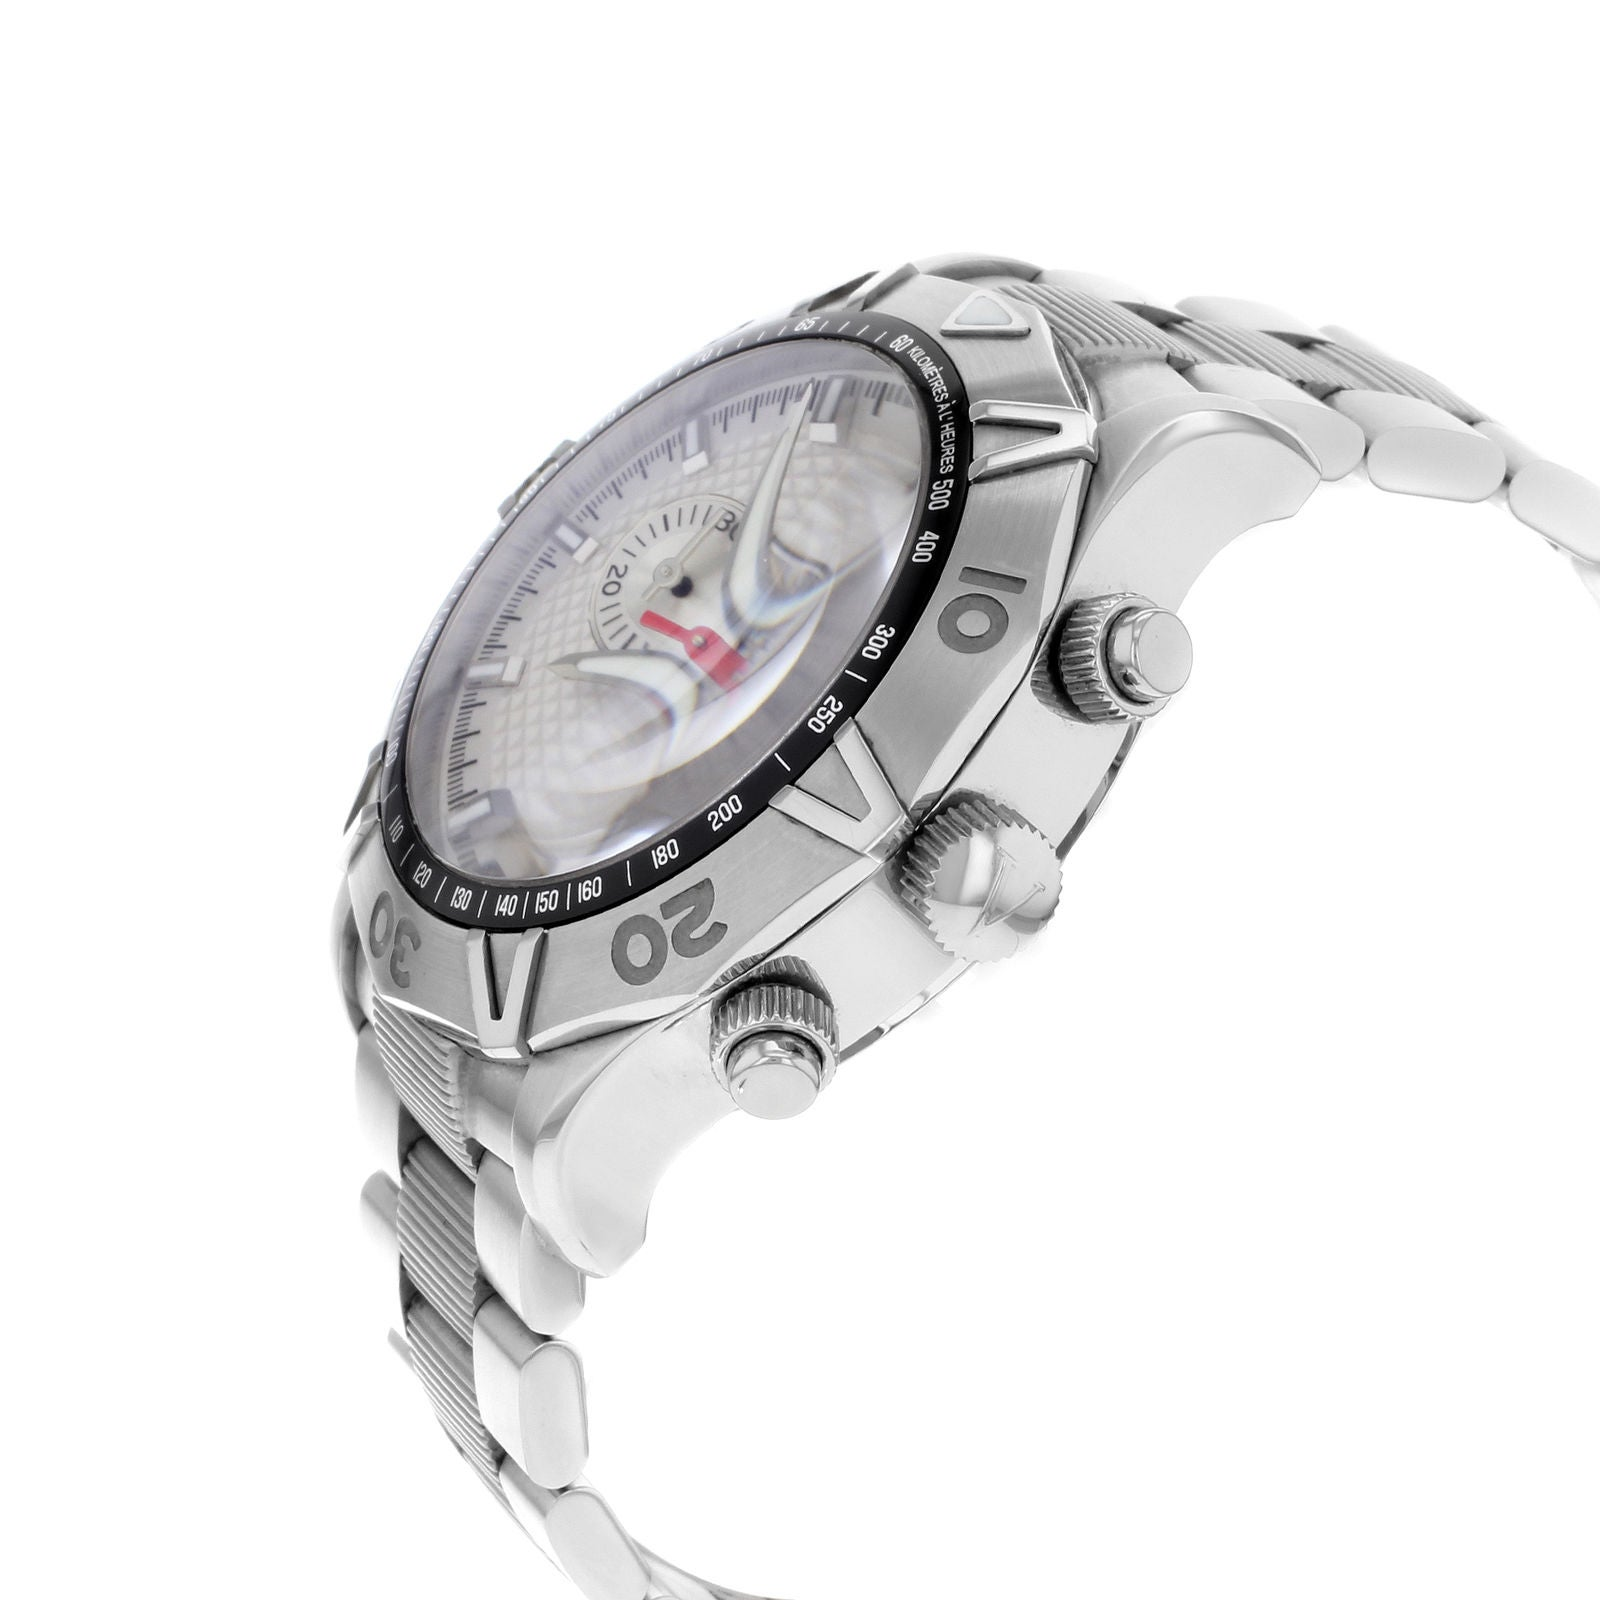 Dial Quartz S099 Stainless Watch White Homme V40lcq9902 Men's Steel Valentino 5ARLc4jS3q